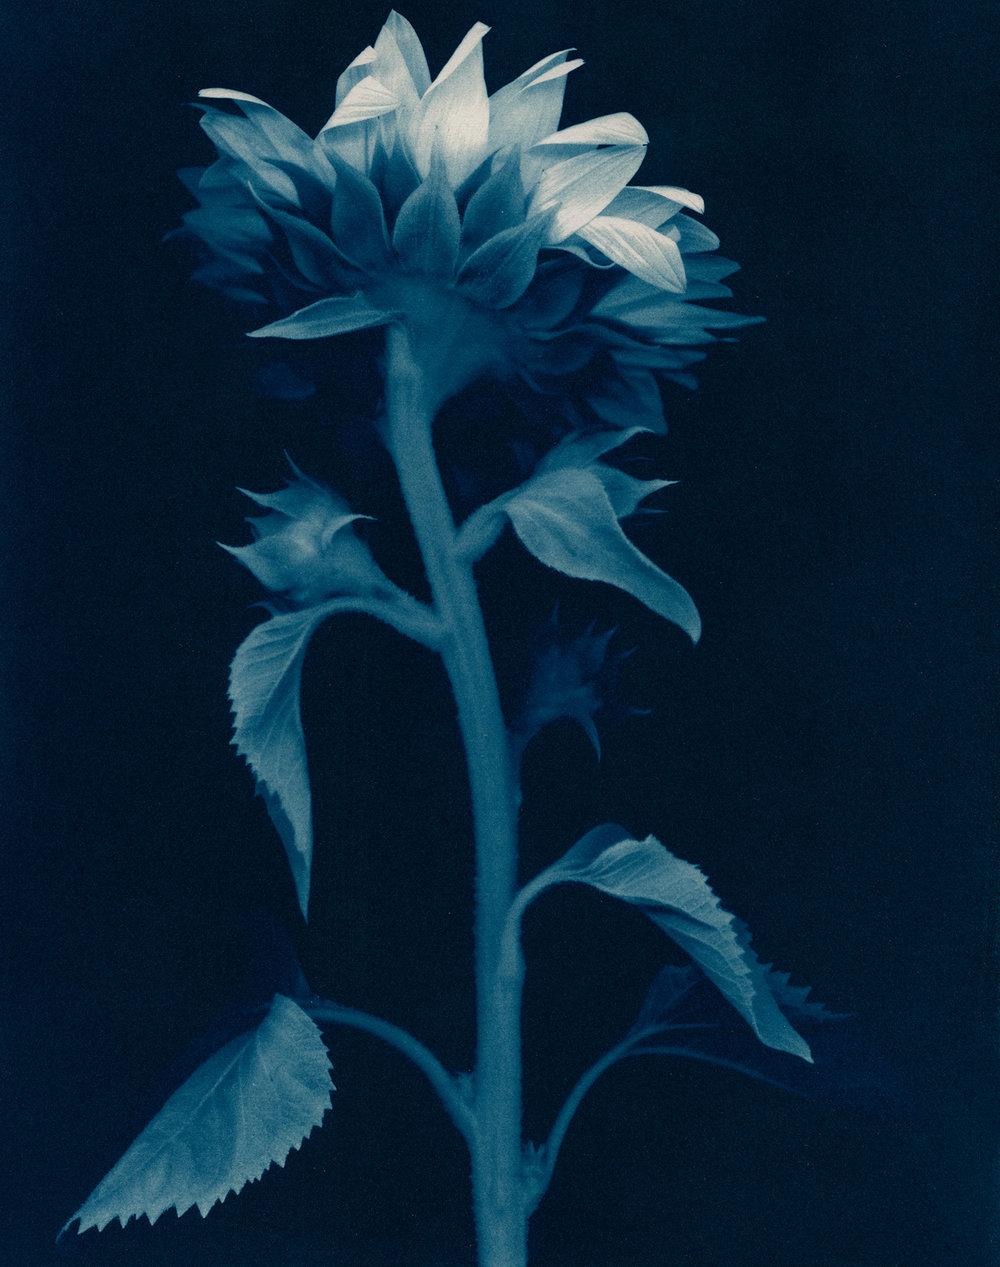 Cyan-Sunflower_back-1900x1500x72dpi-Sq.jpg